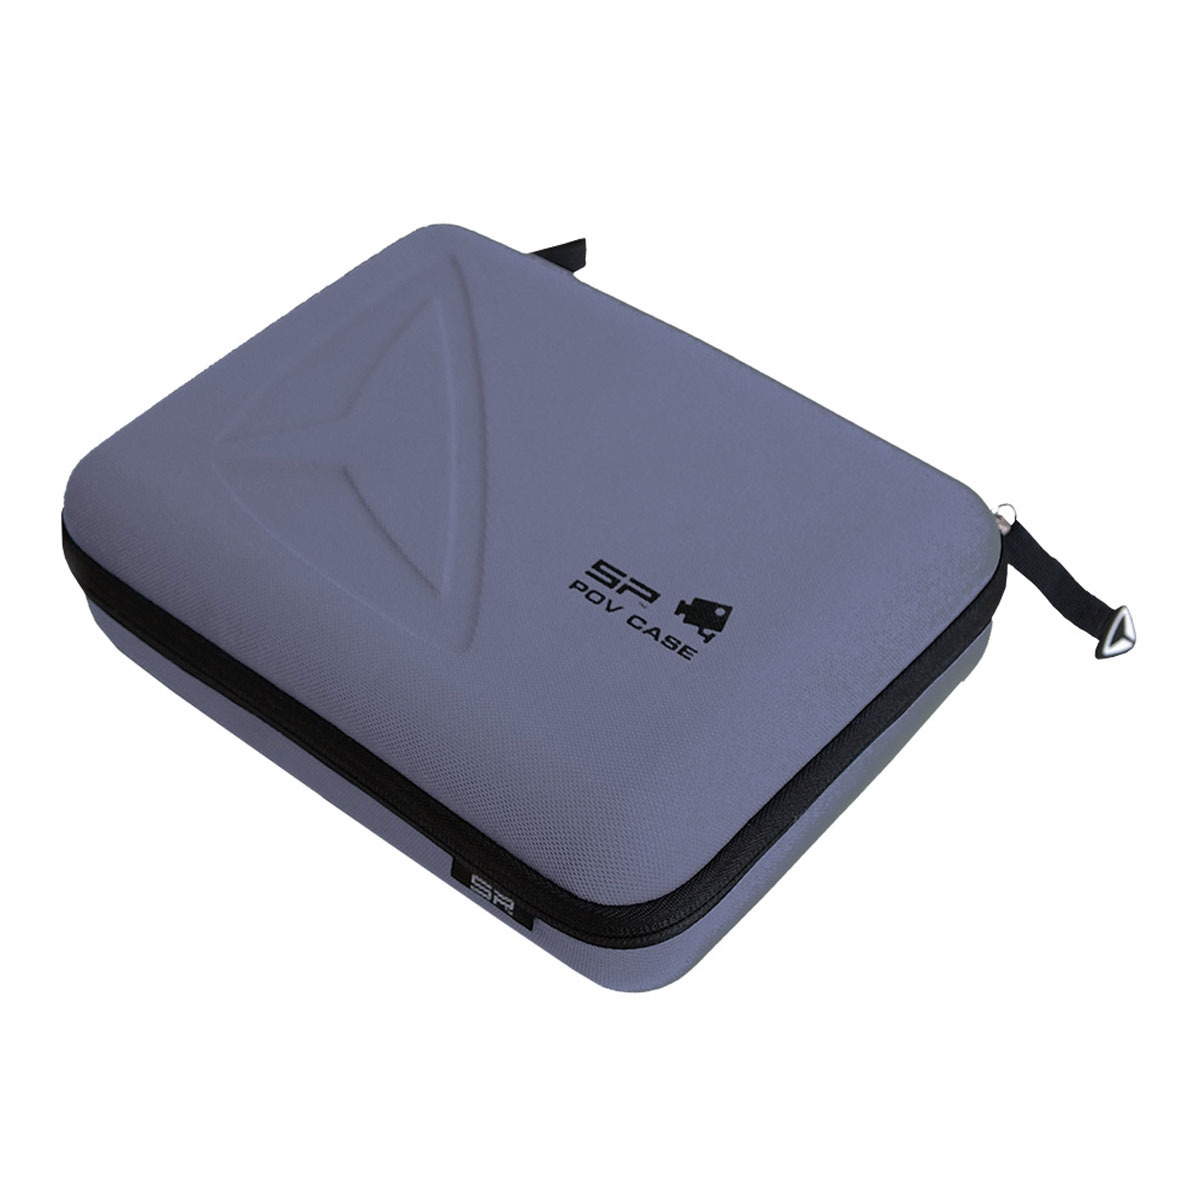 SP GADGETS Case Small grey - pouzdro pro GoPro